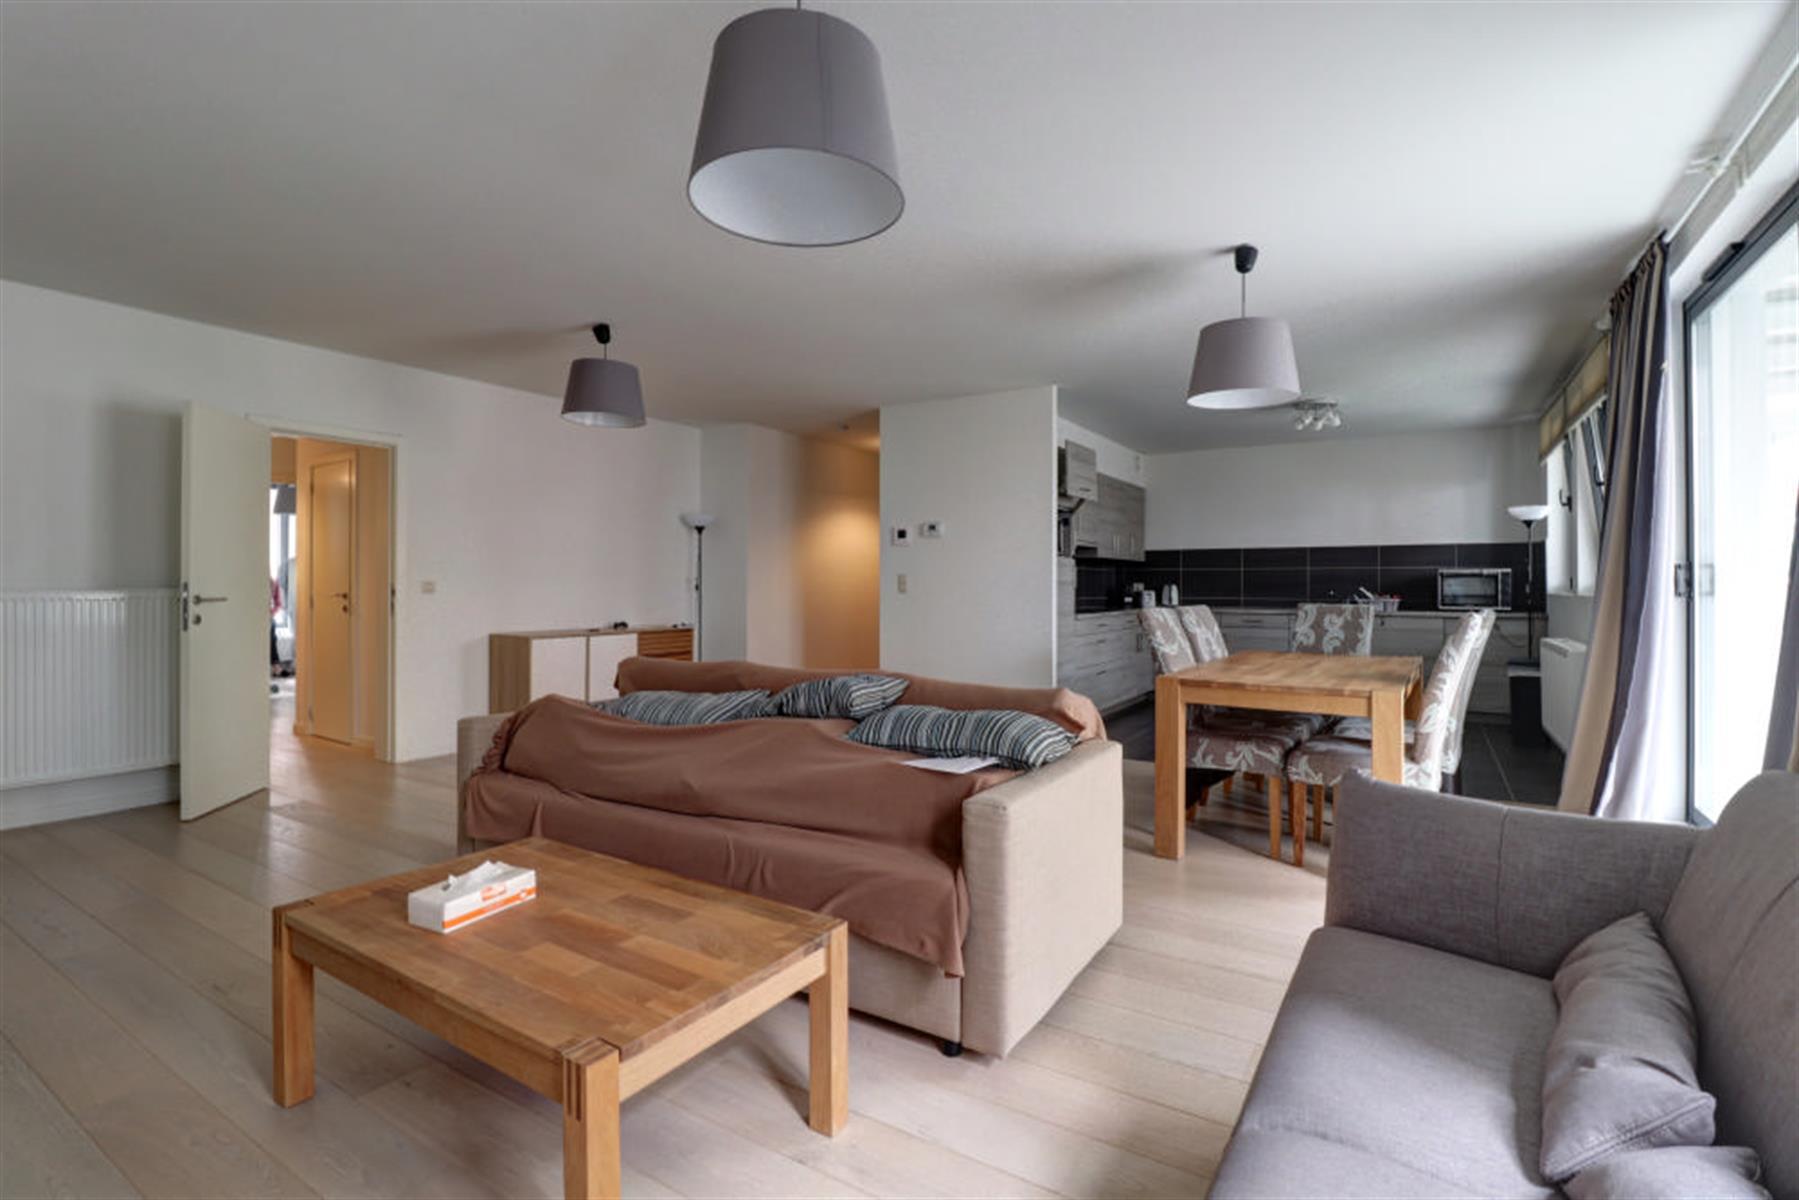 Flat - Etterbeek - #3905829-8